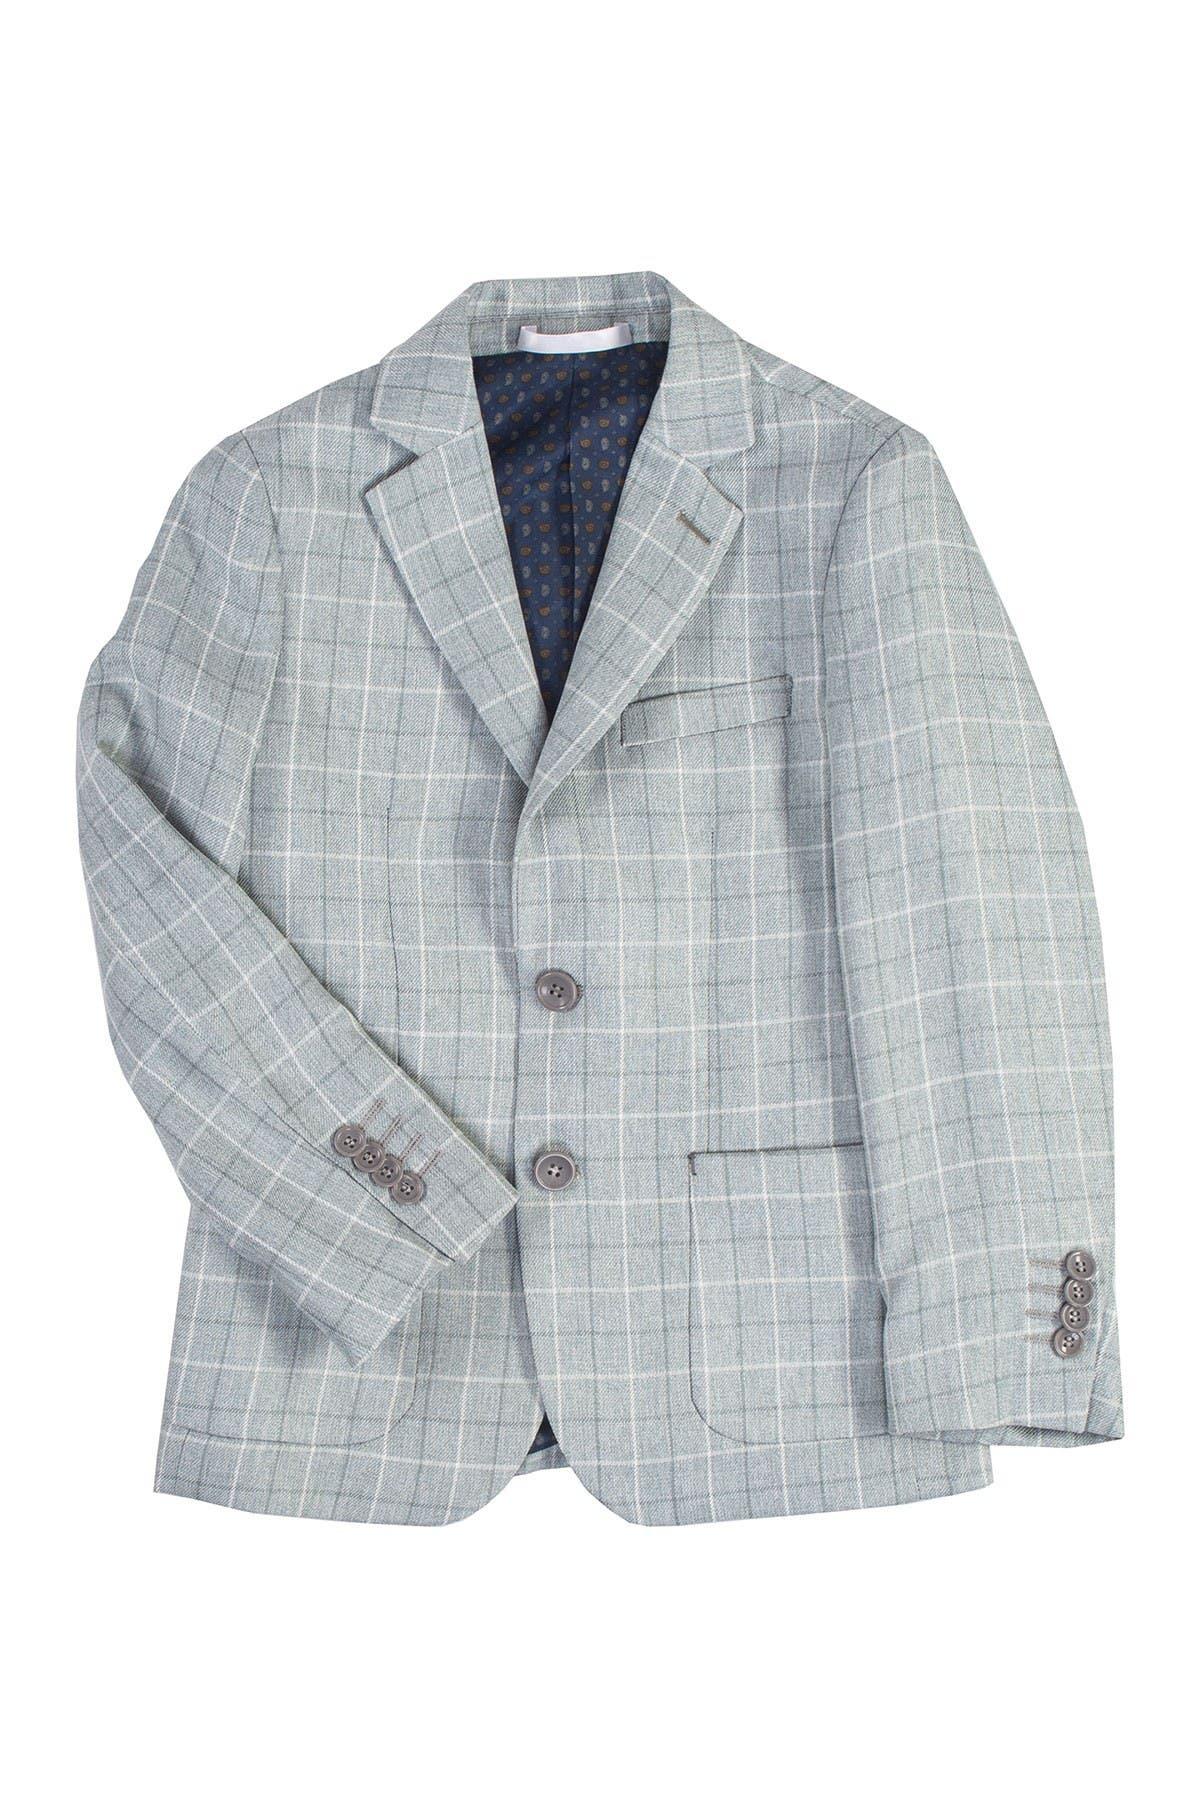 Image of Isaac Mizrahi Multi Check Blazer